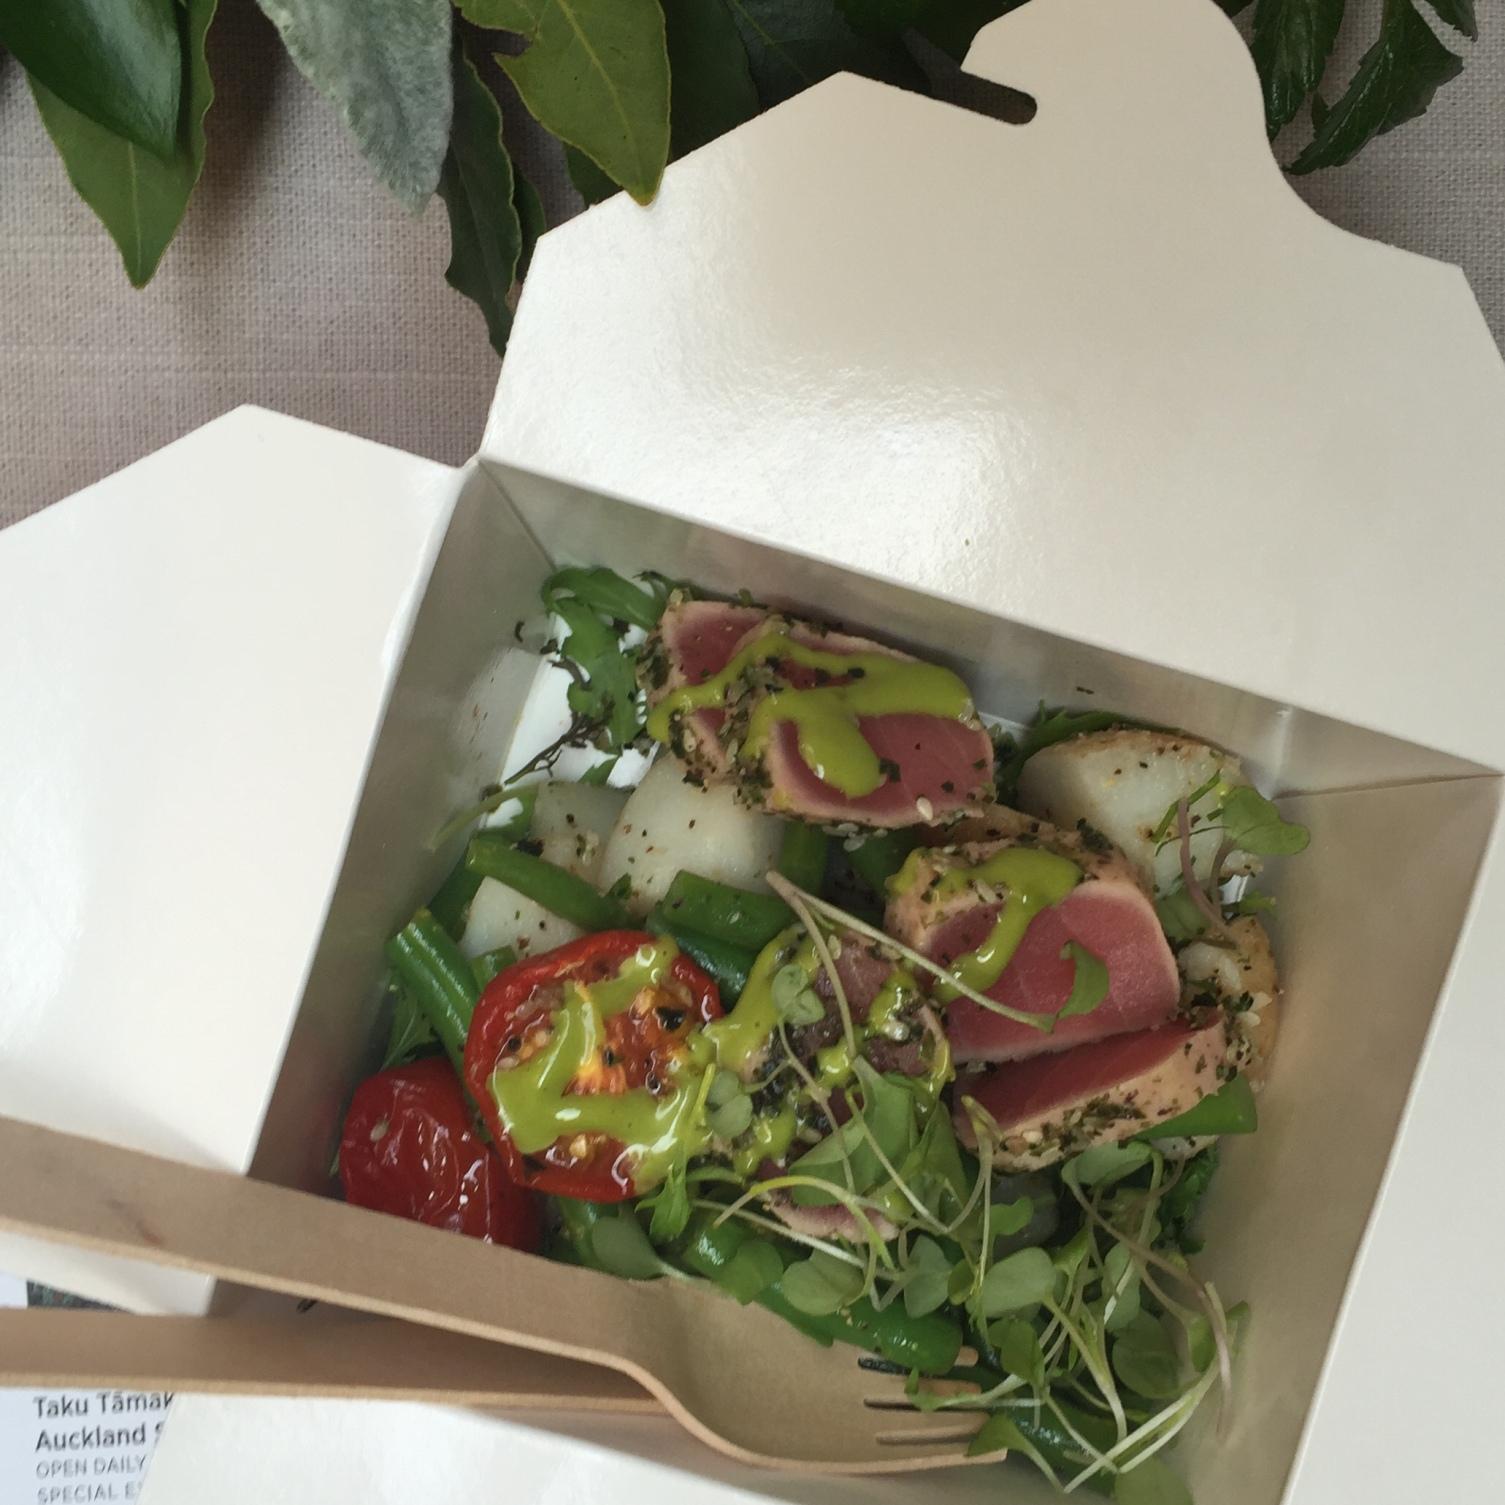 Furiyaki crusted tuna, baby potatoes, wakame beans, tomato confit and lime dressing